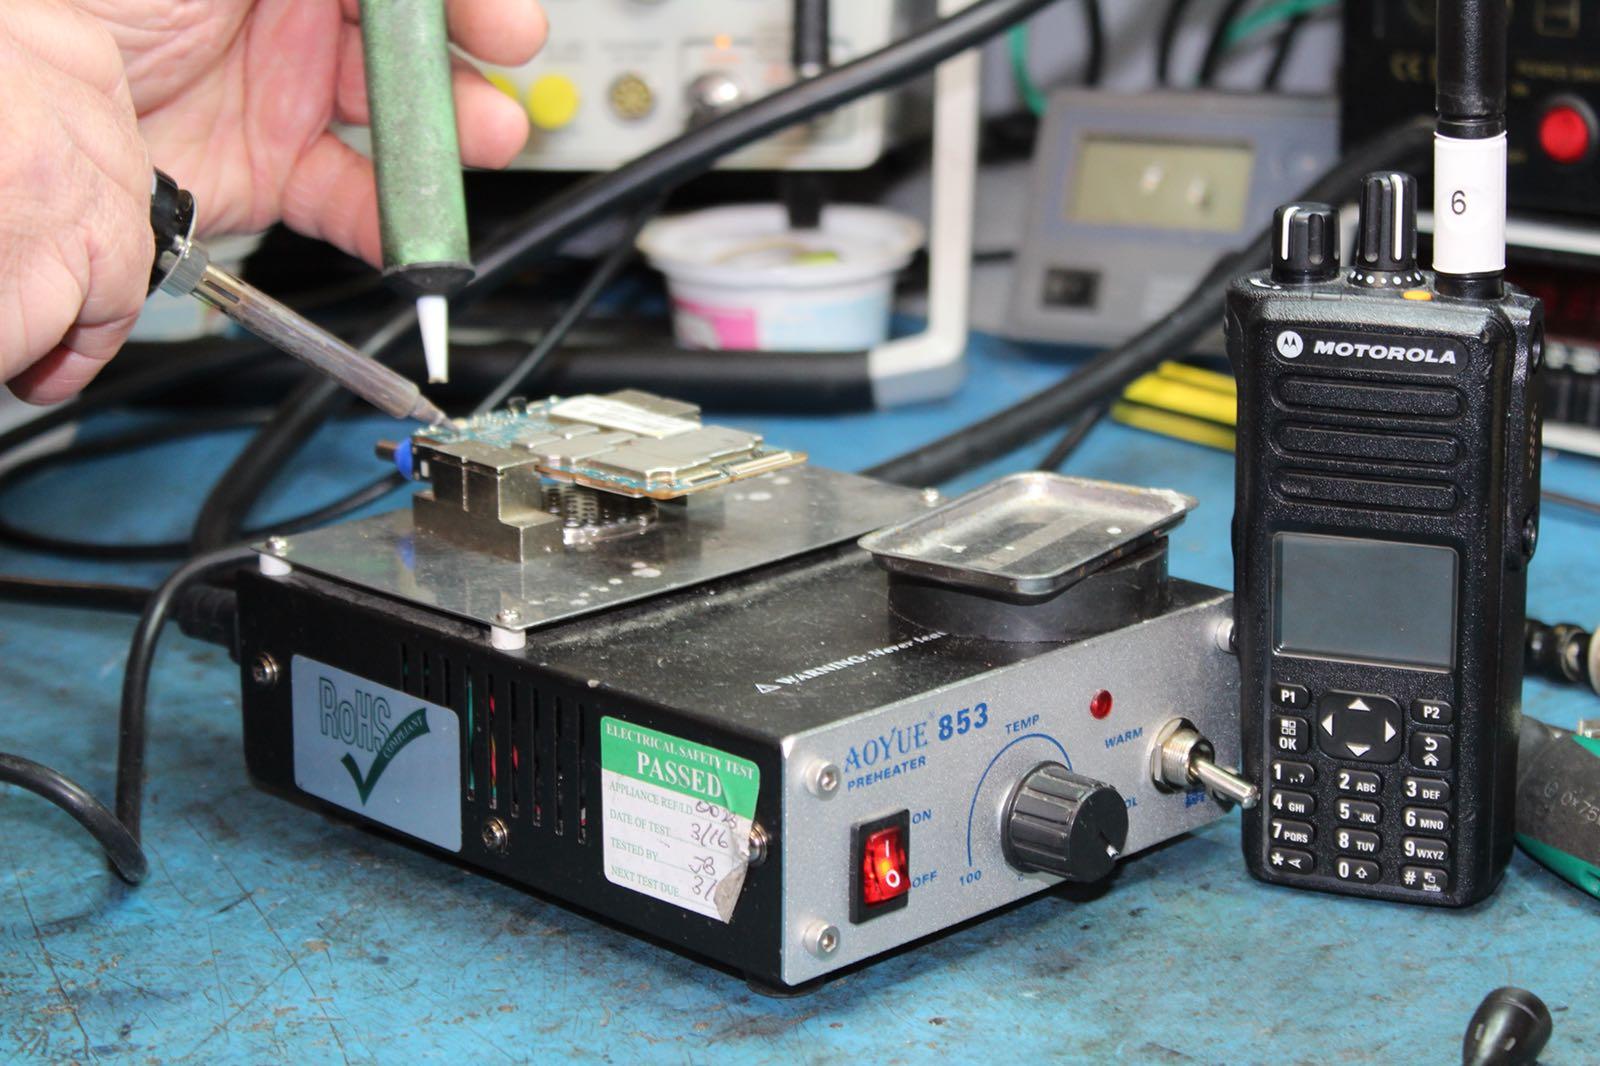 A Mobile Radio Wiring - All Diagram Schematics